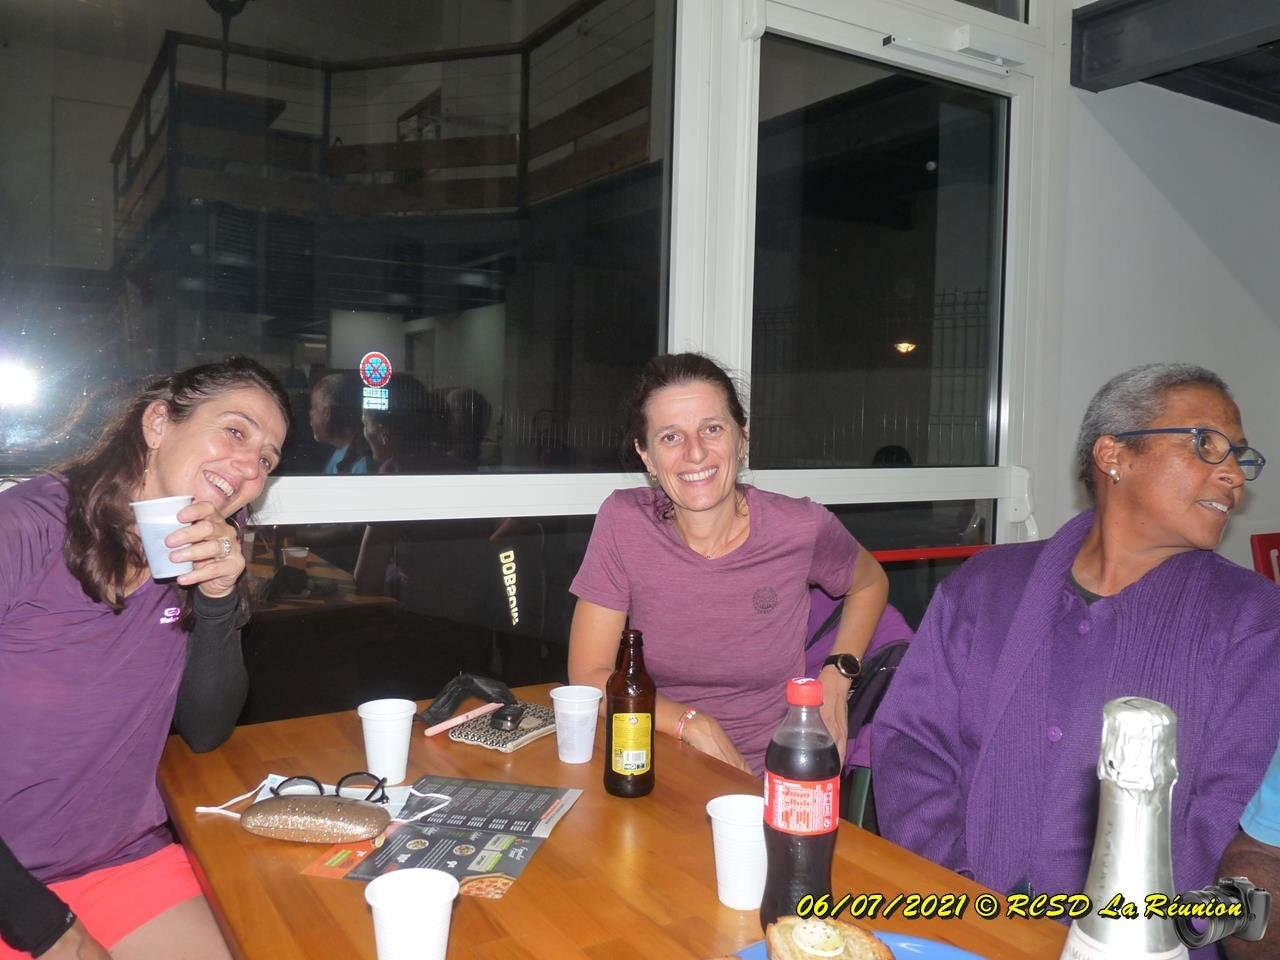 20210706 Entrain Trail Trinité 084